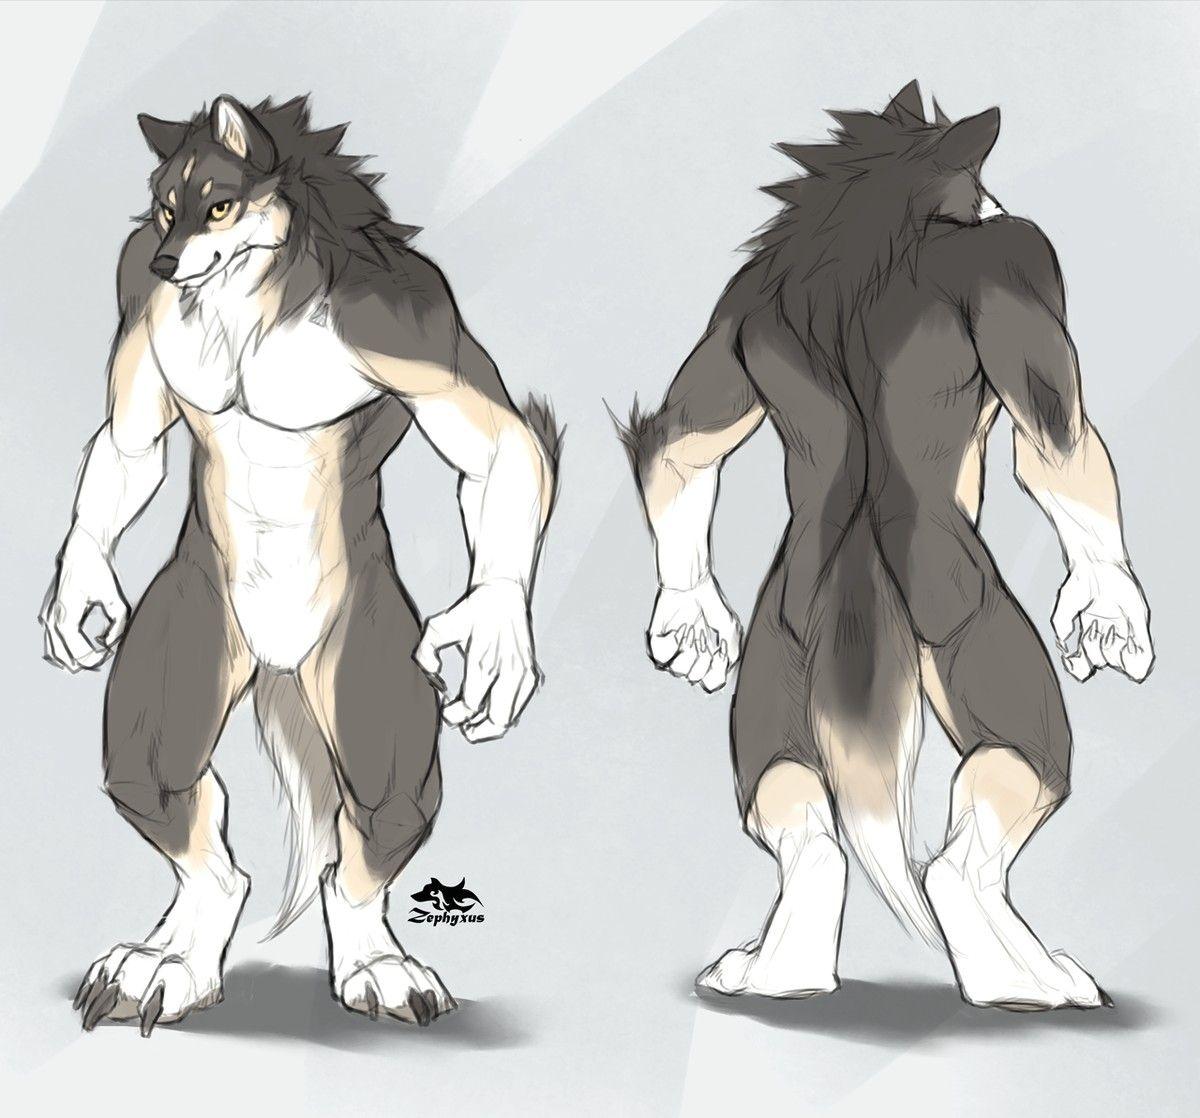 kaalulangus robb wolf